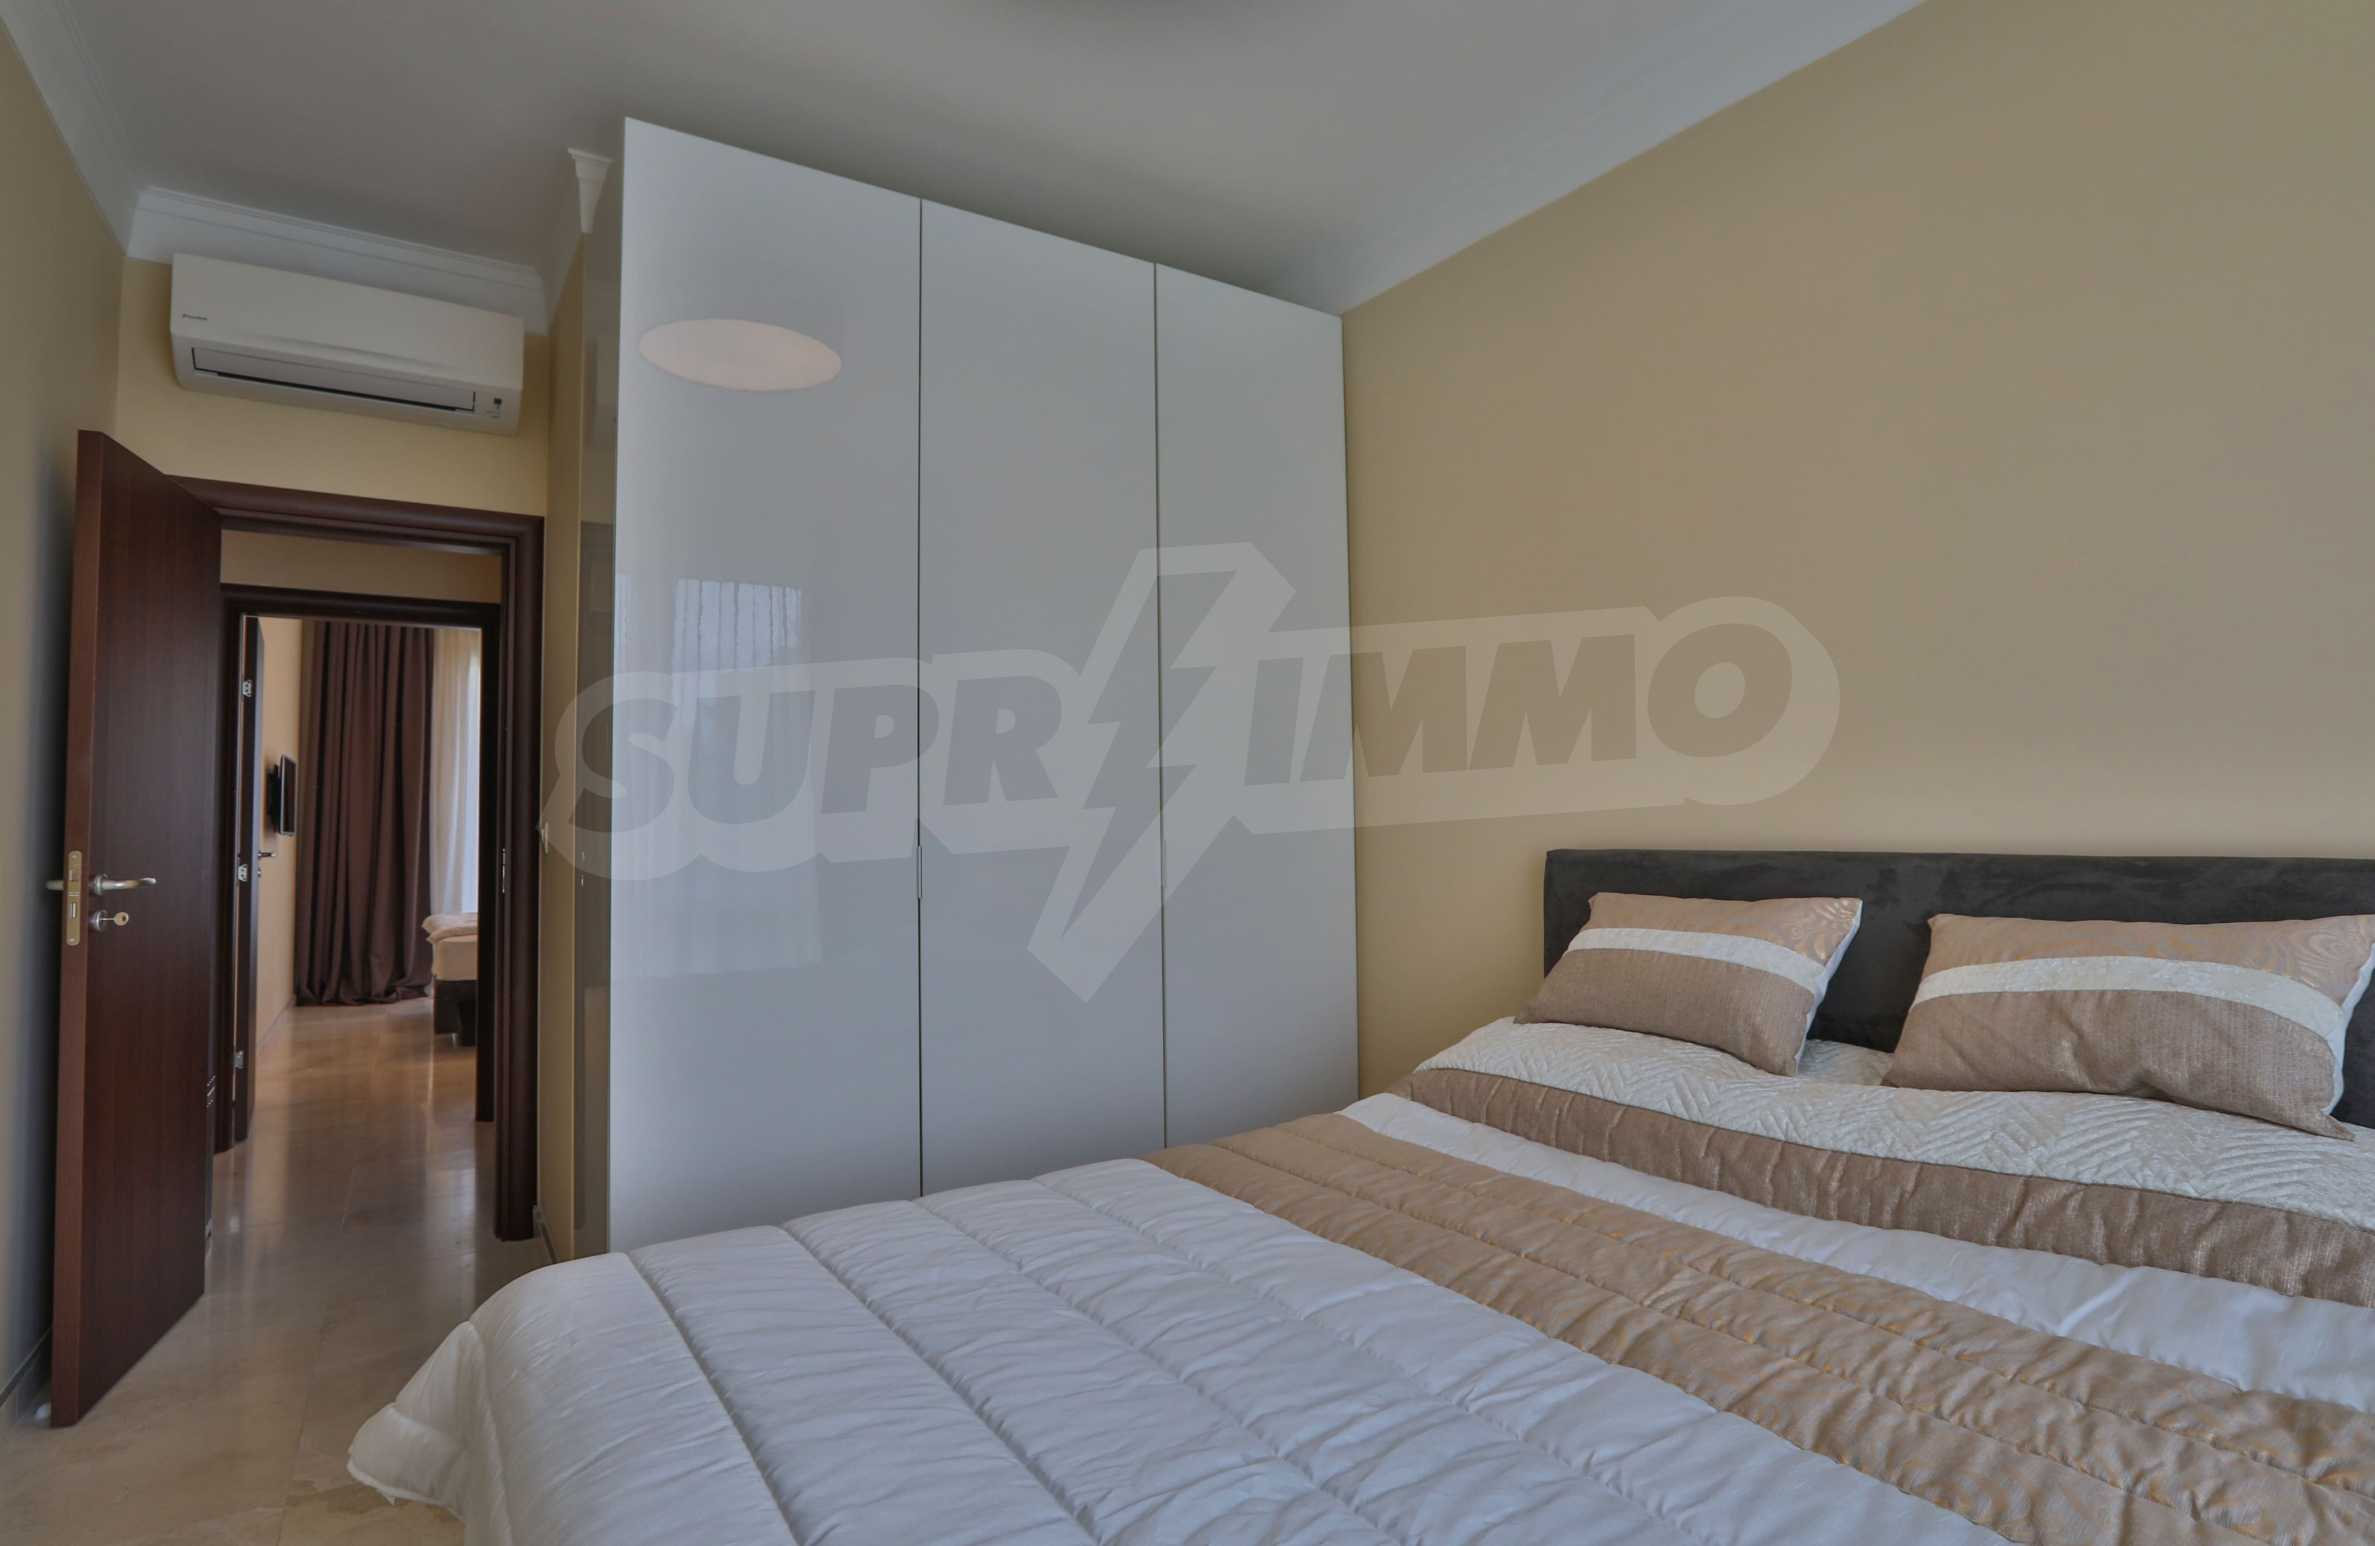 Дизайнерски тристаен апартамент под наем за летен сезон в резиденция Belle Époque в Лозенец 20